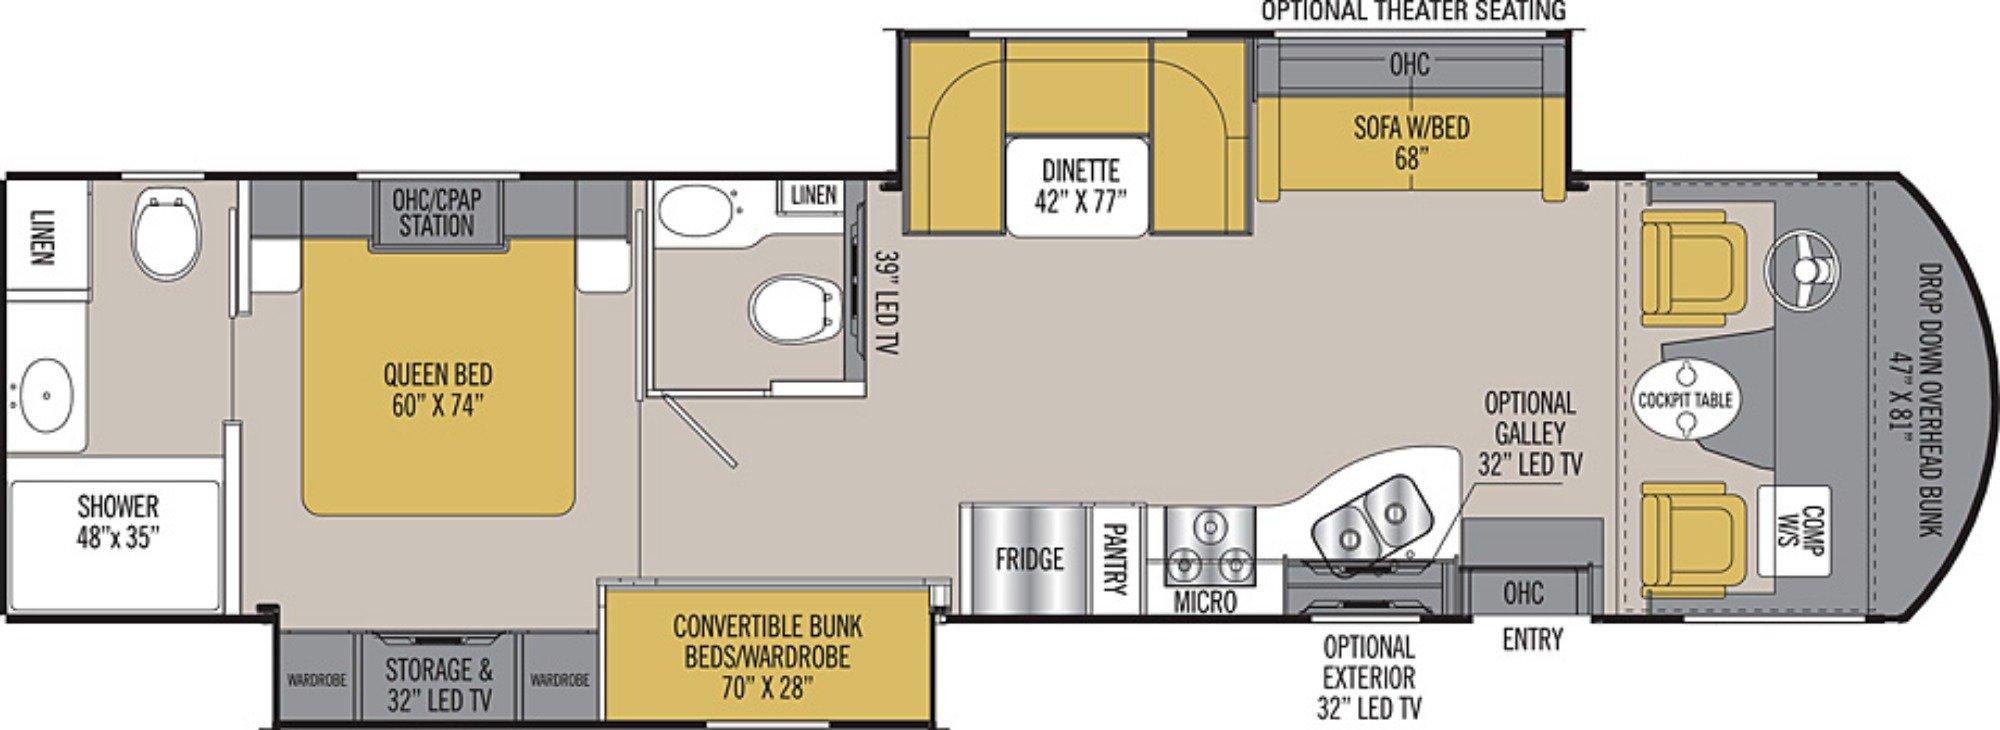 View Floor Plan for 2019 COACHMEN MIRADA 35BH